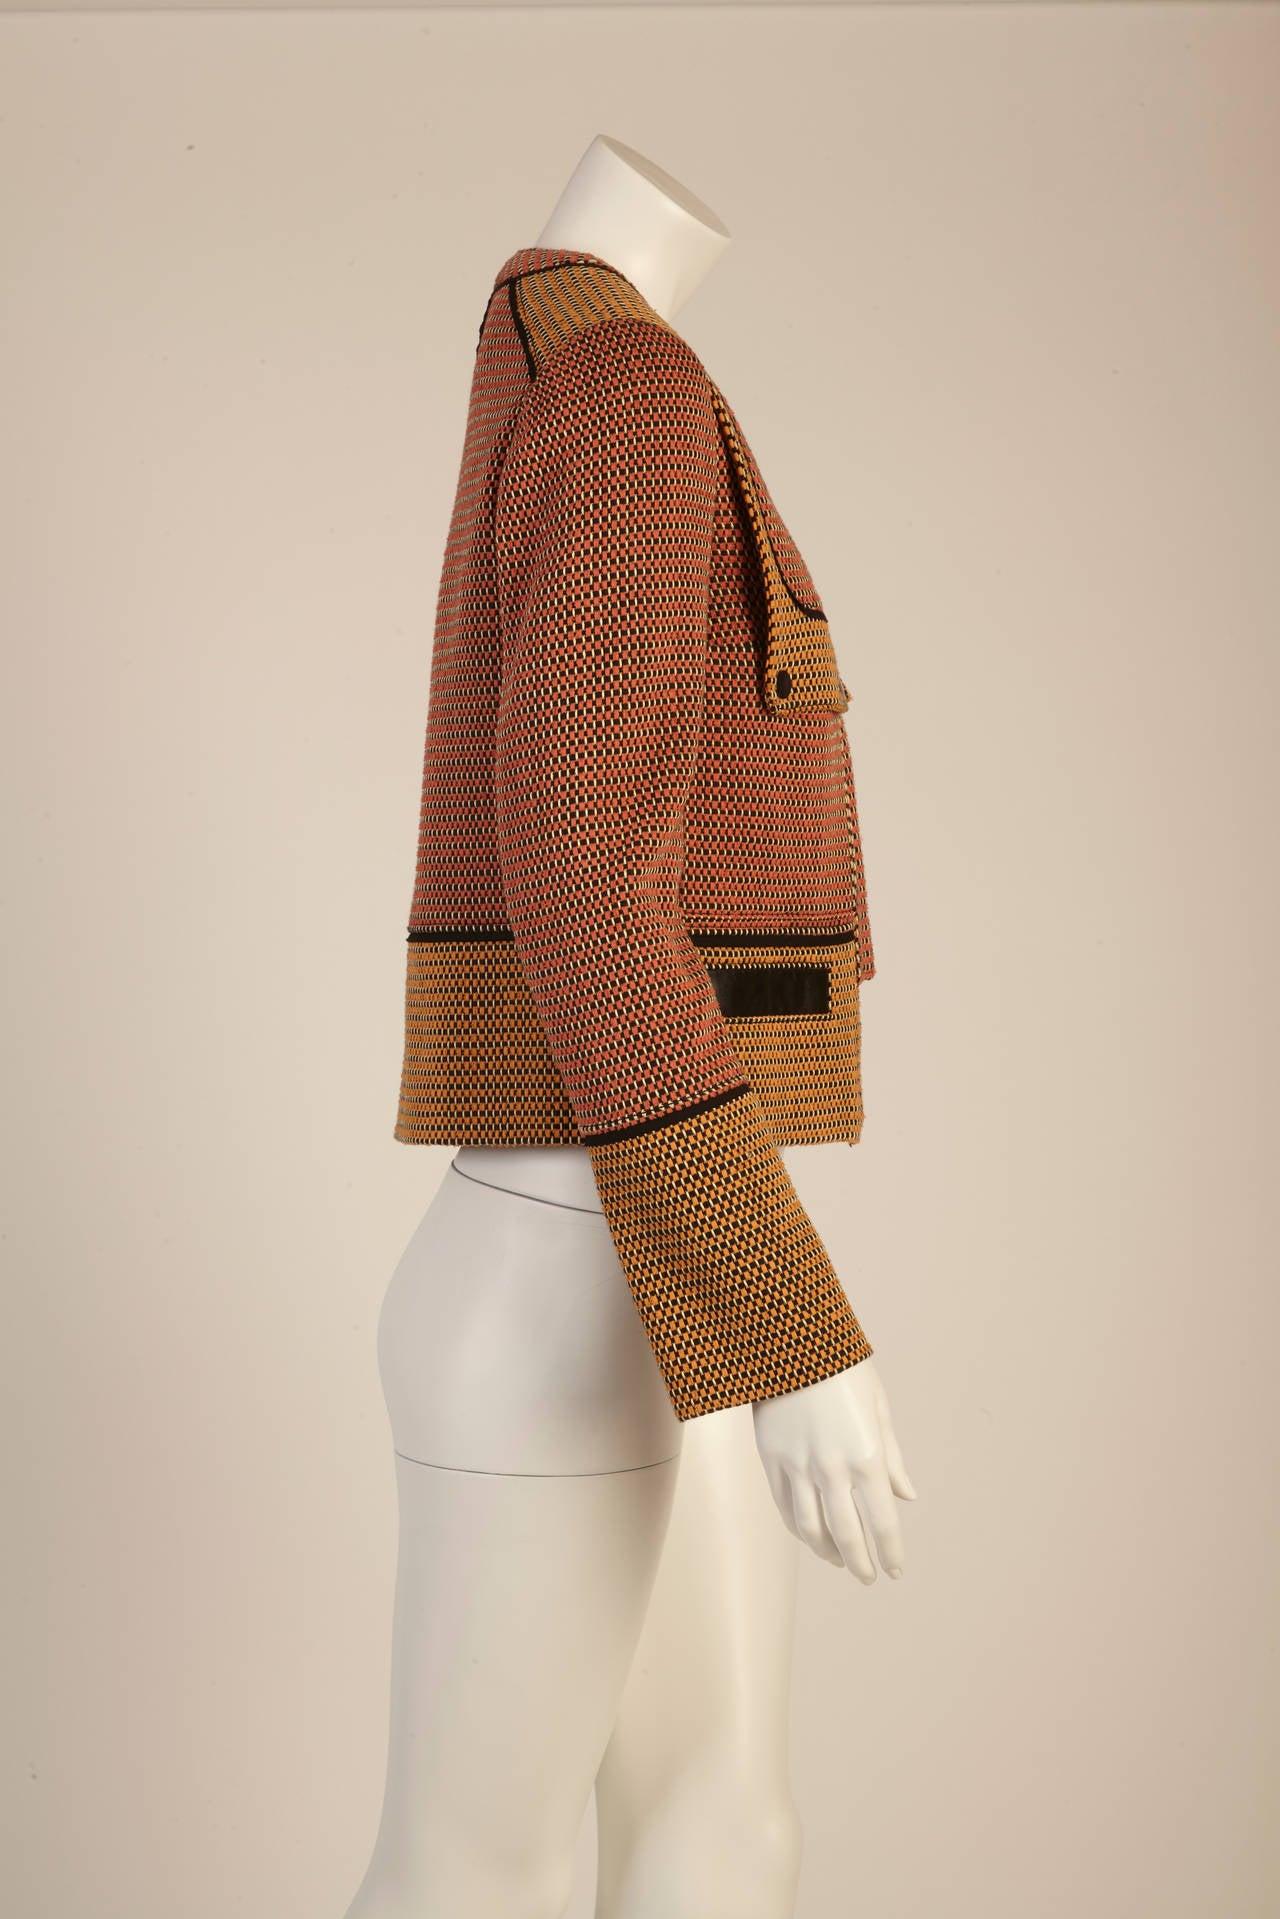 Proenza Schouler Multi-Color Jacket 6